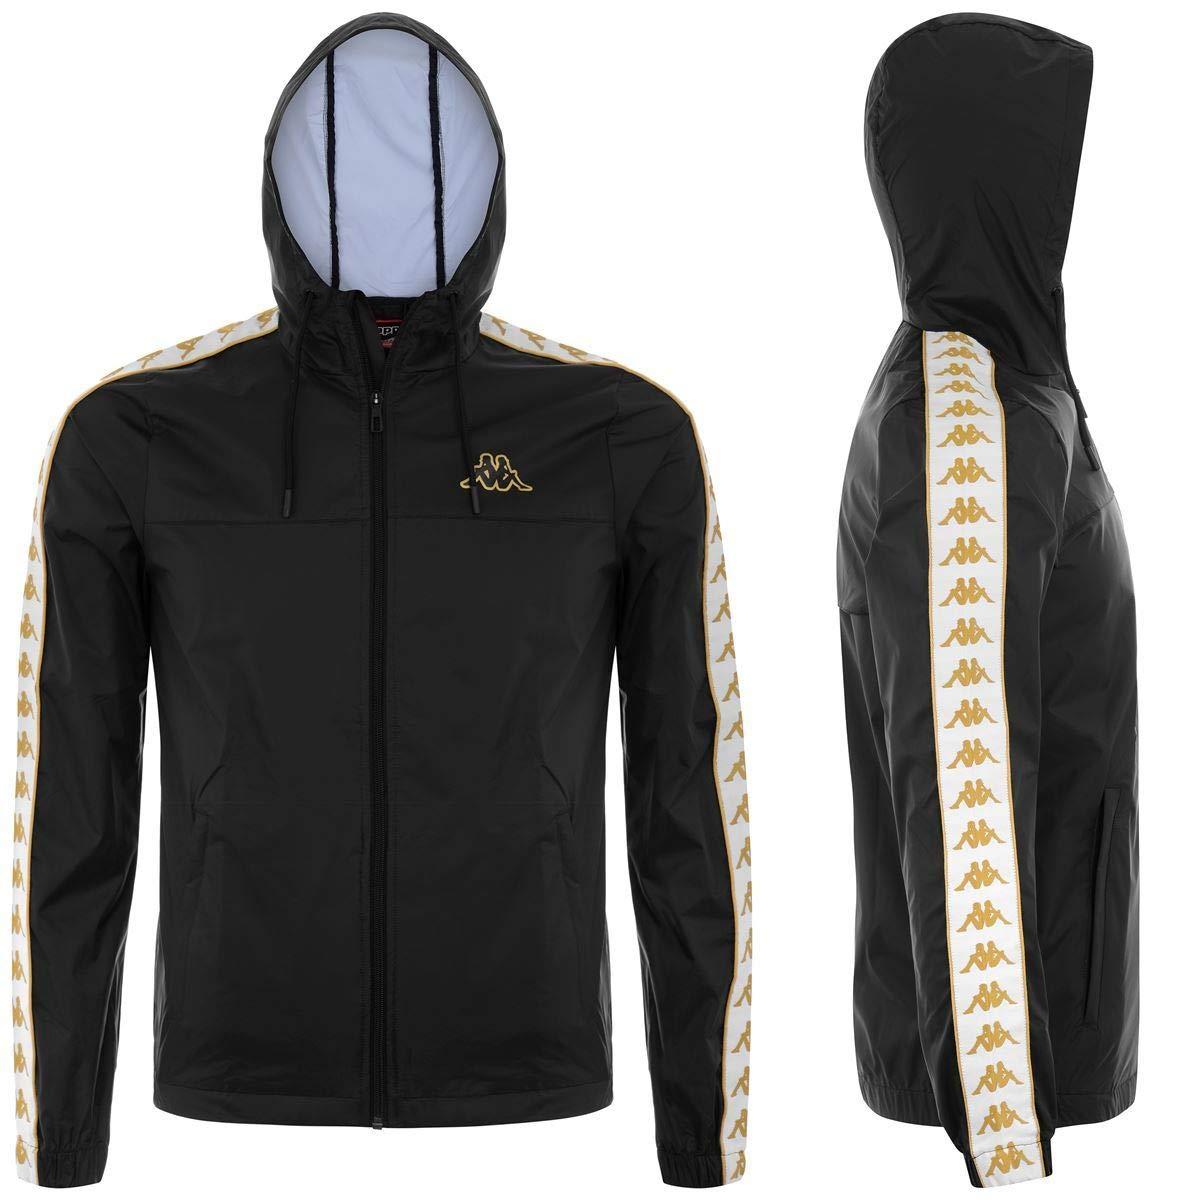 b70ebf938d Kappa 222 Banda Dawson Men Hoodie Jacket - Black/White/Gold at ...